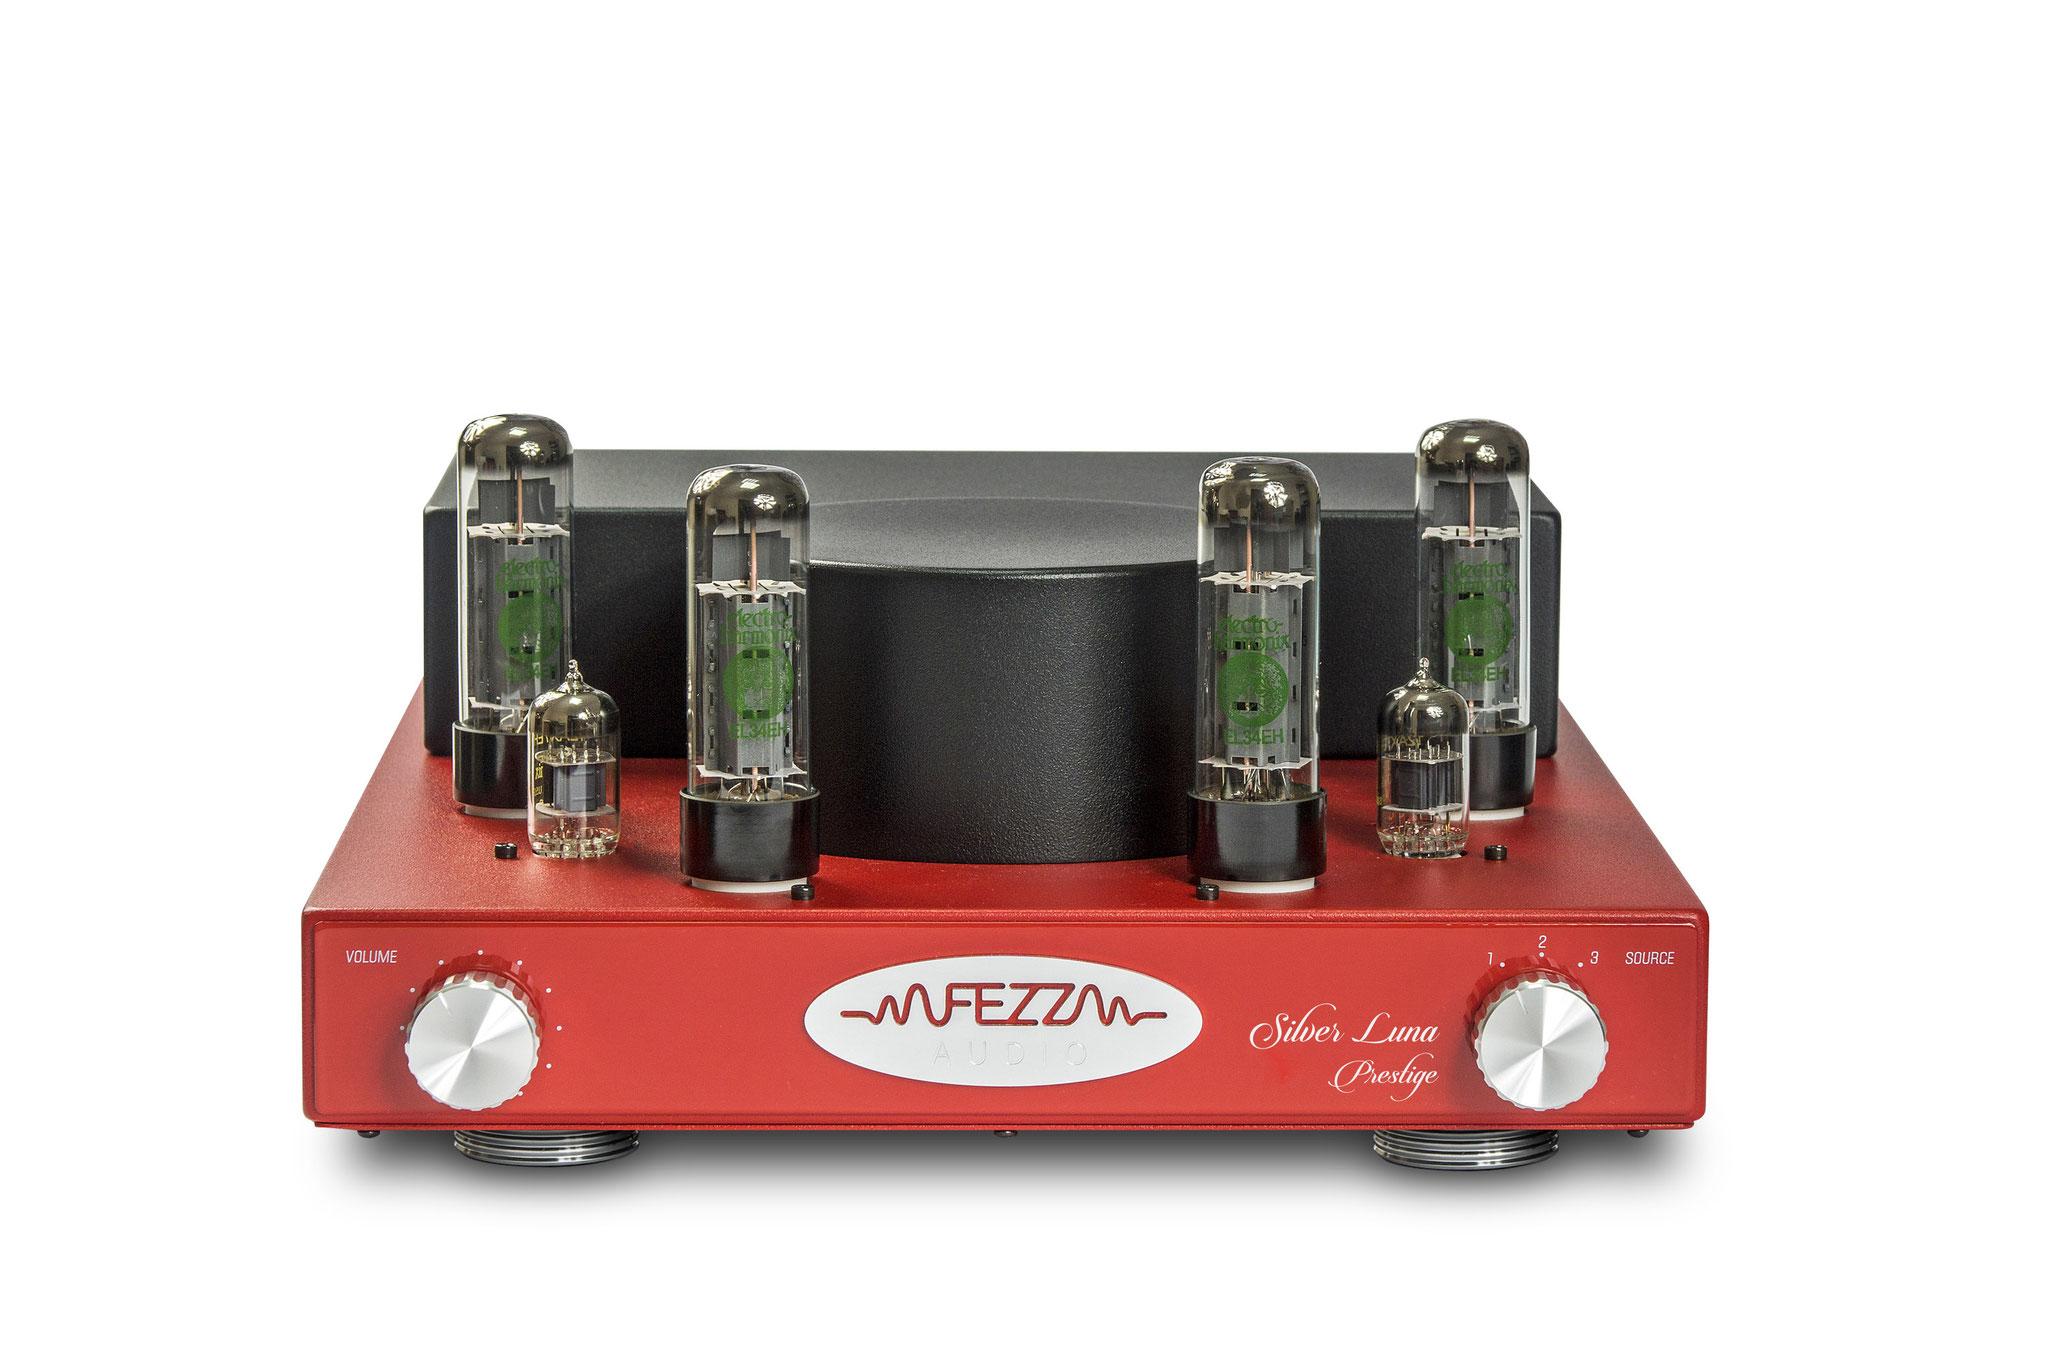 FEZZ Audio Silver Luna Signature